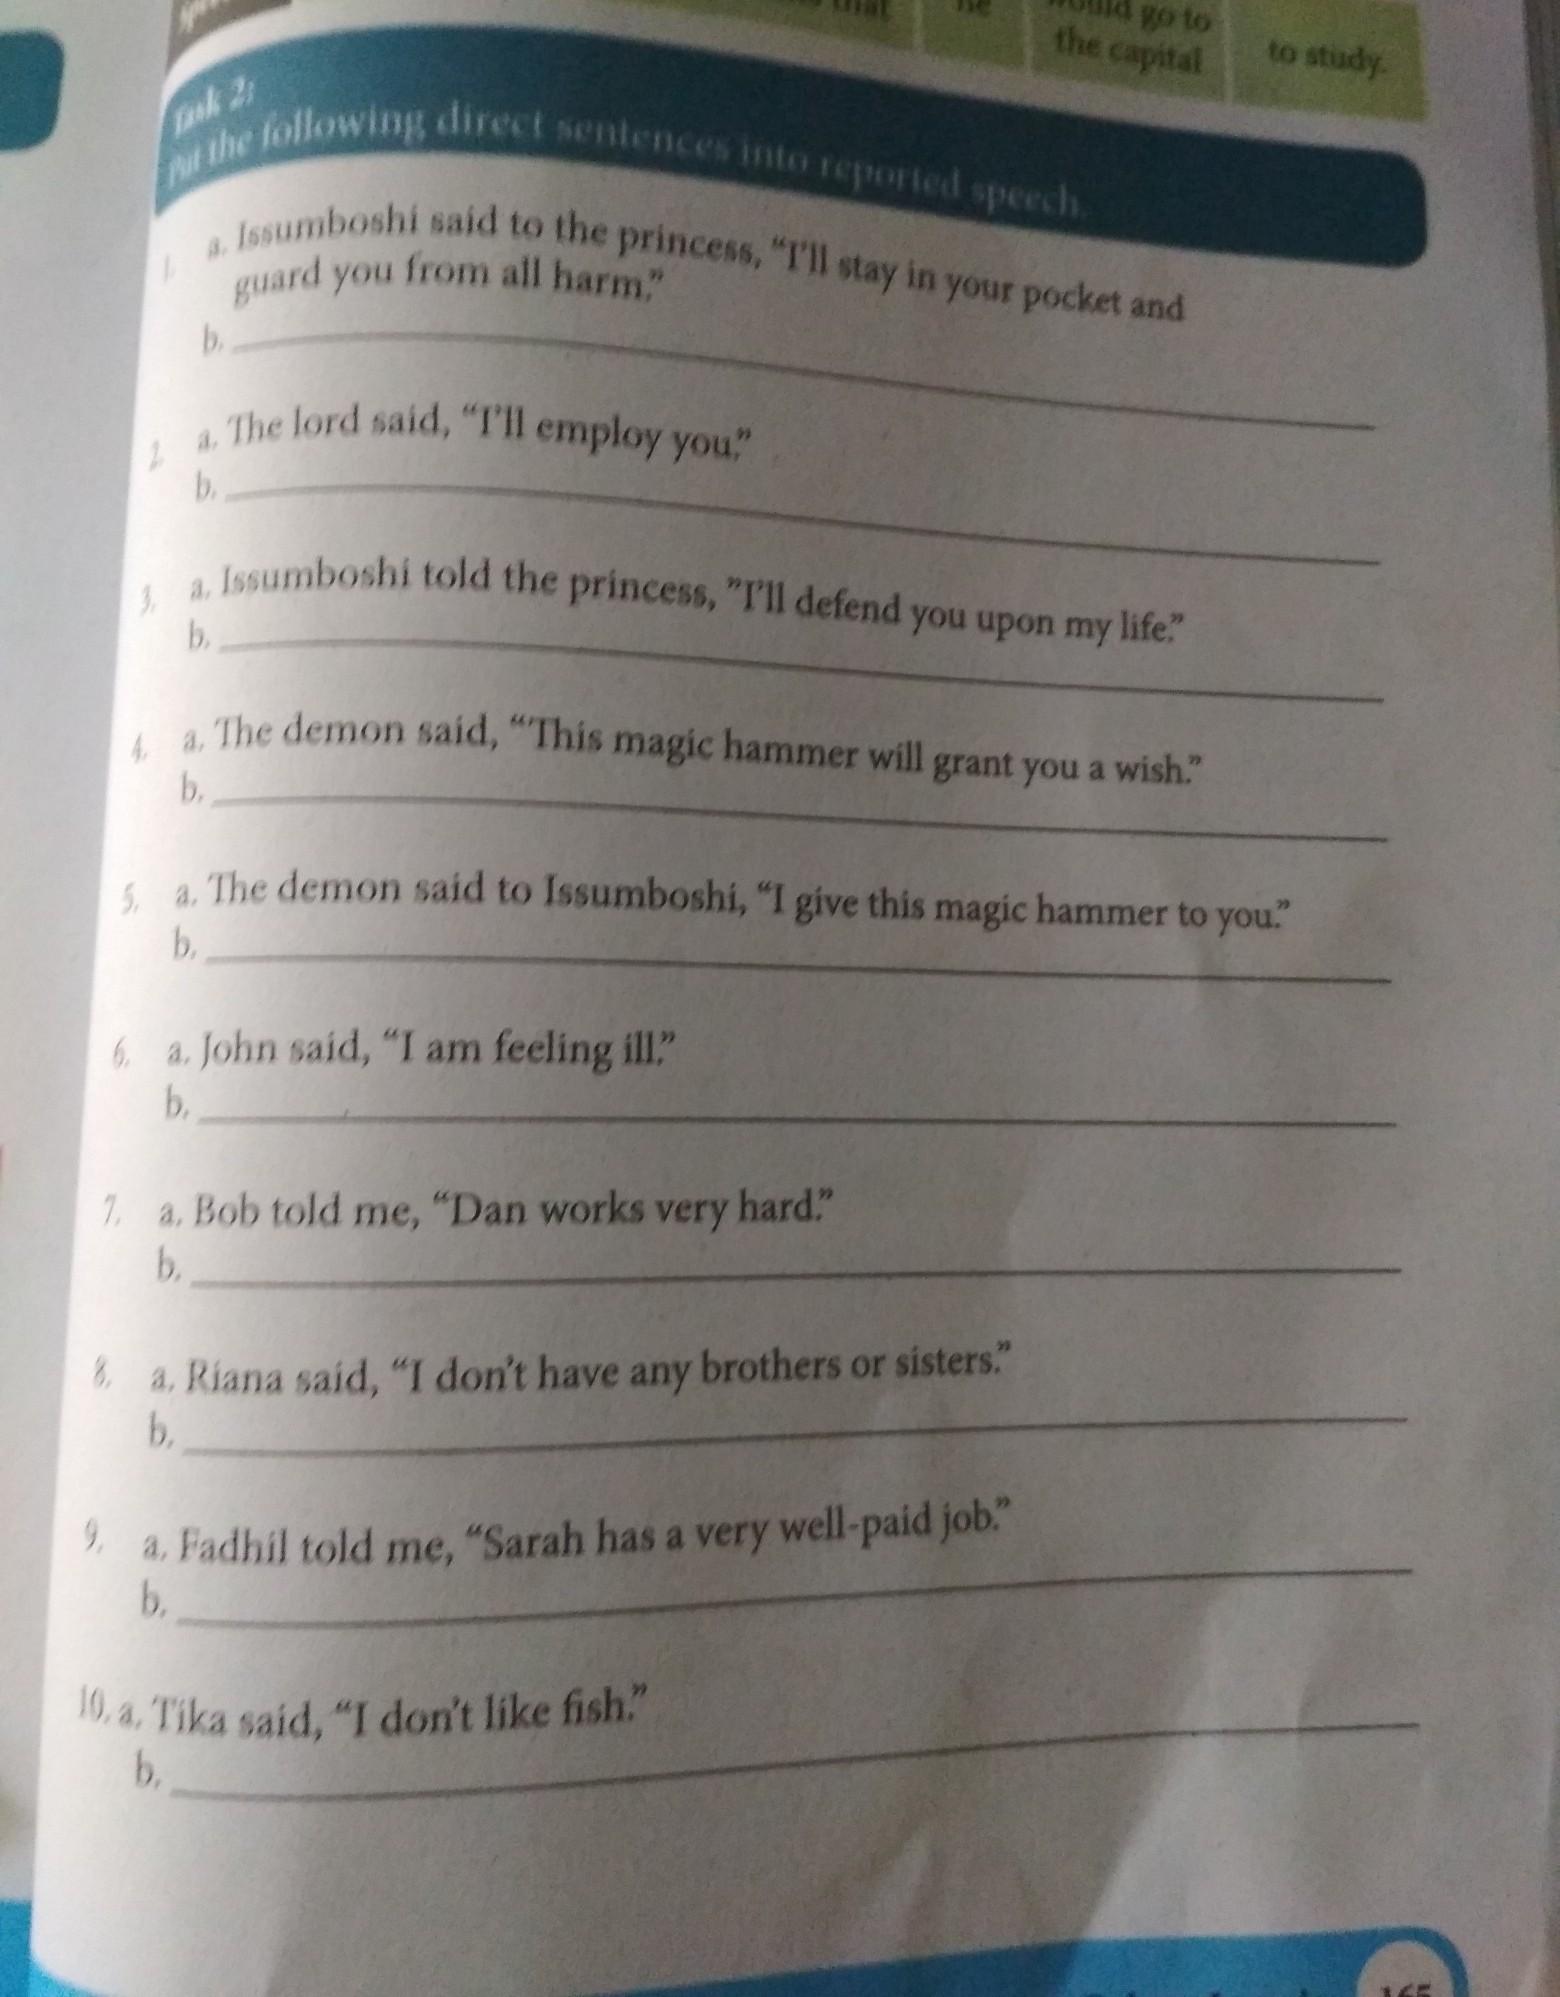 Soal Bahasa Inggris Kelas 10 Semester 2 : bahasa, inggris, kelas, semester, Jawaban, Inggris, Paket, Kelas, Kurikulum, Brainly.co.id